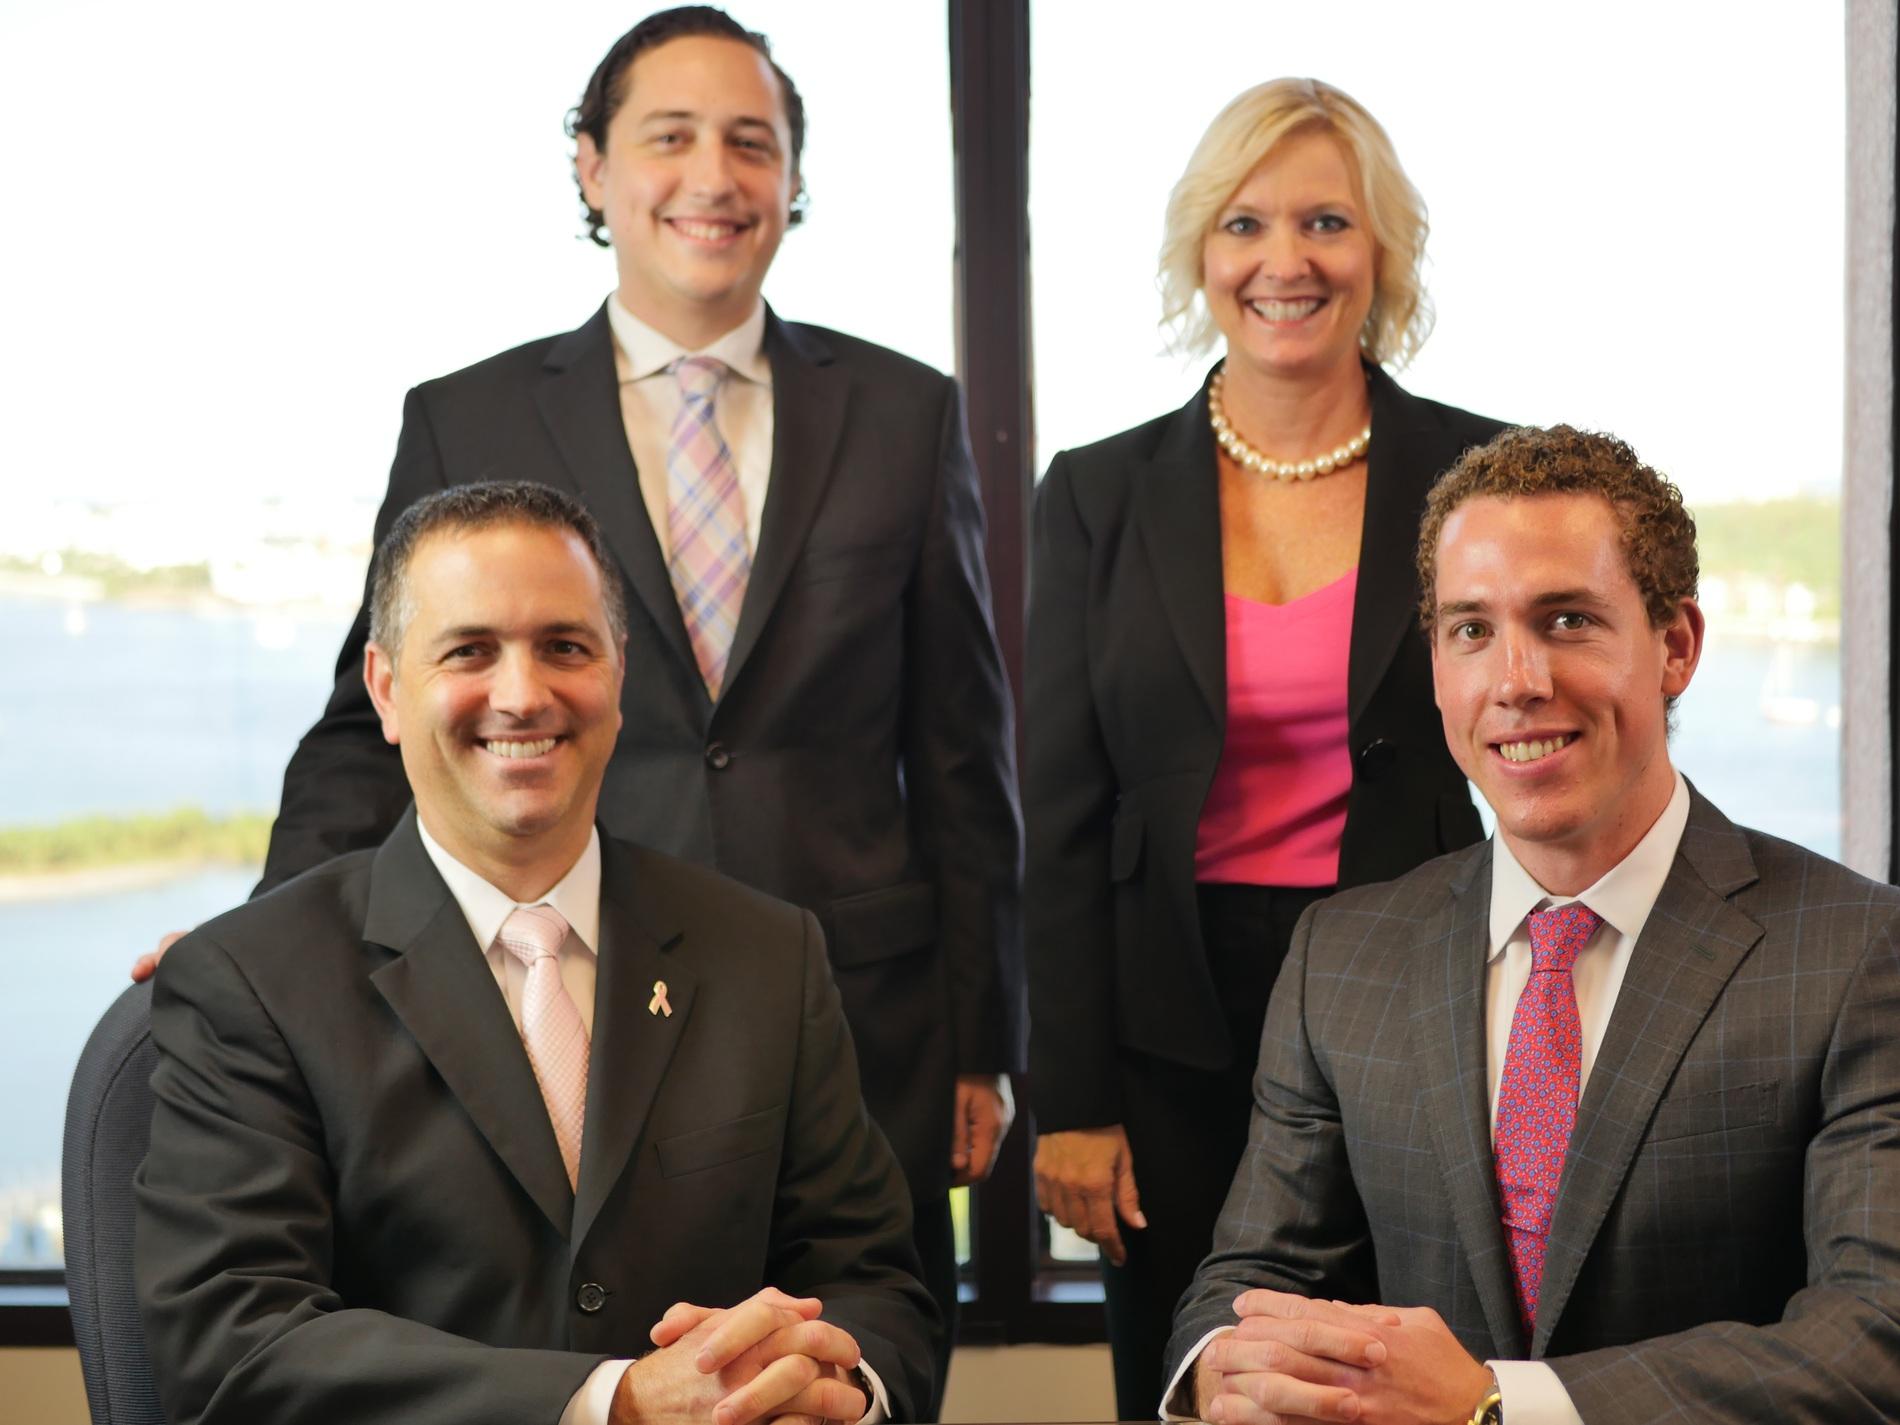 The Nickler Group   West Palm Beach, FL   Morgan Stanley